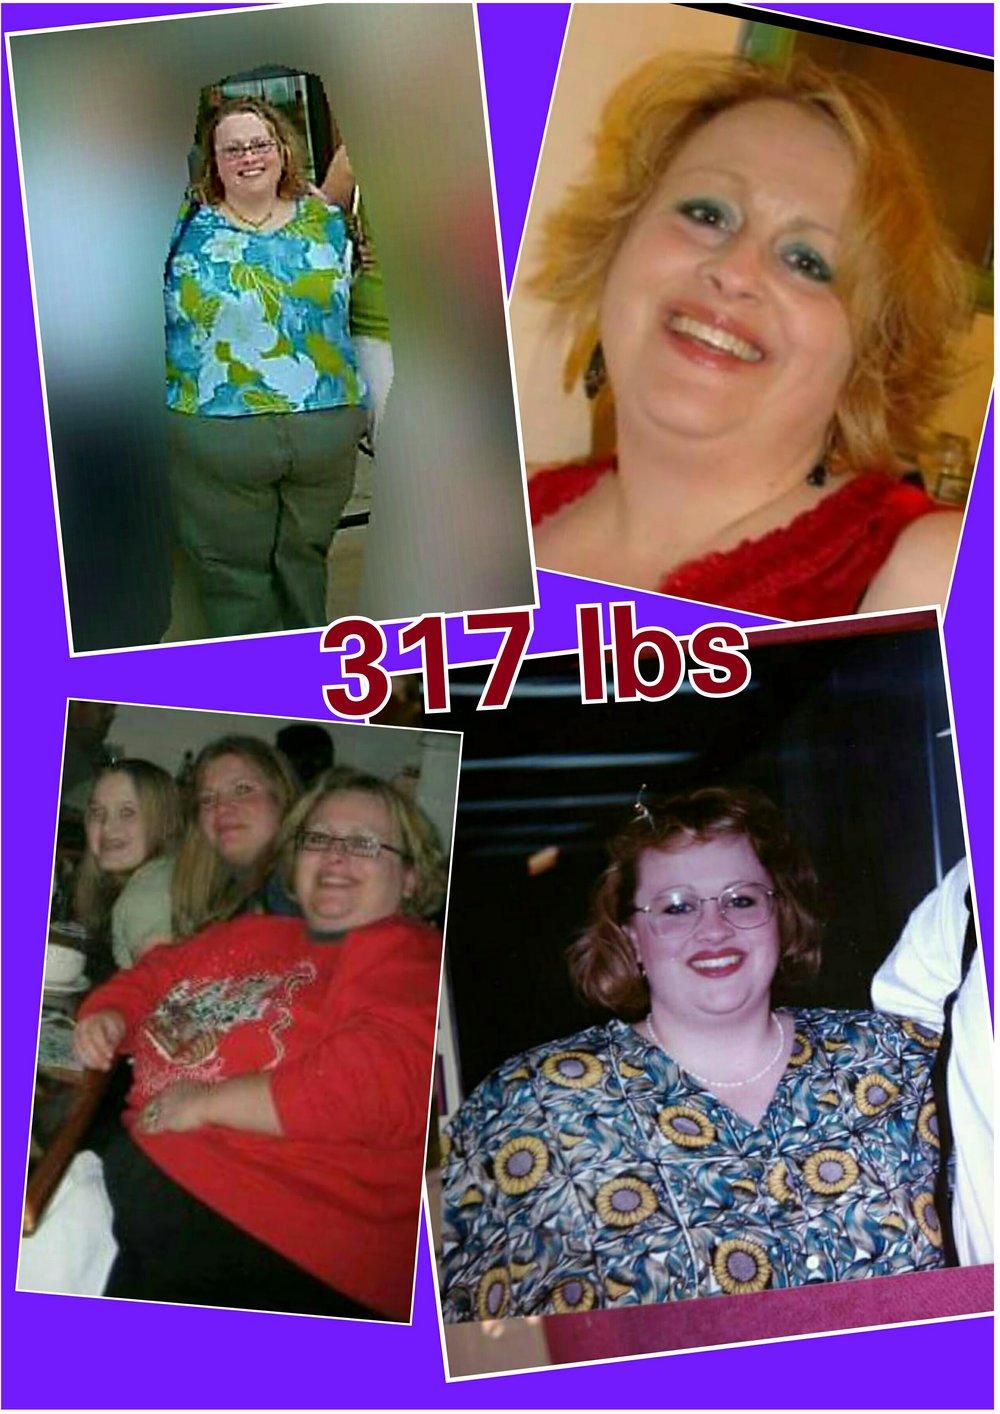 mbs progress photo me3.jpg